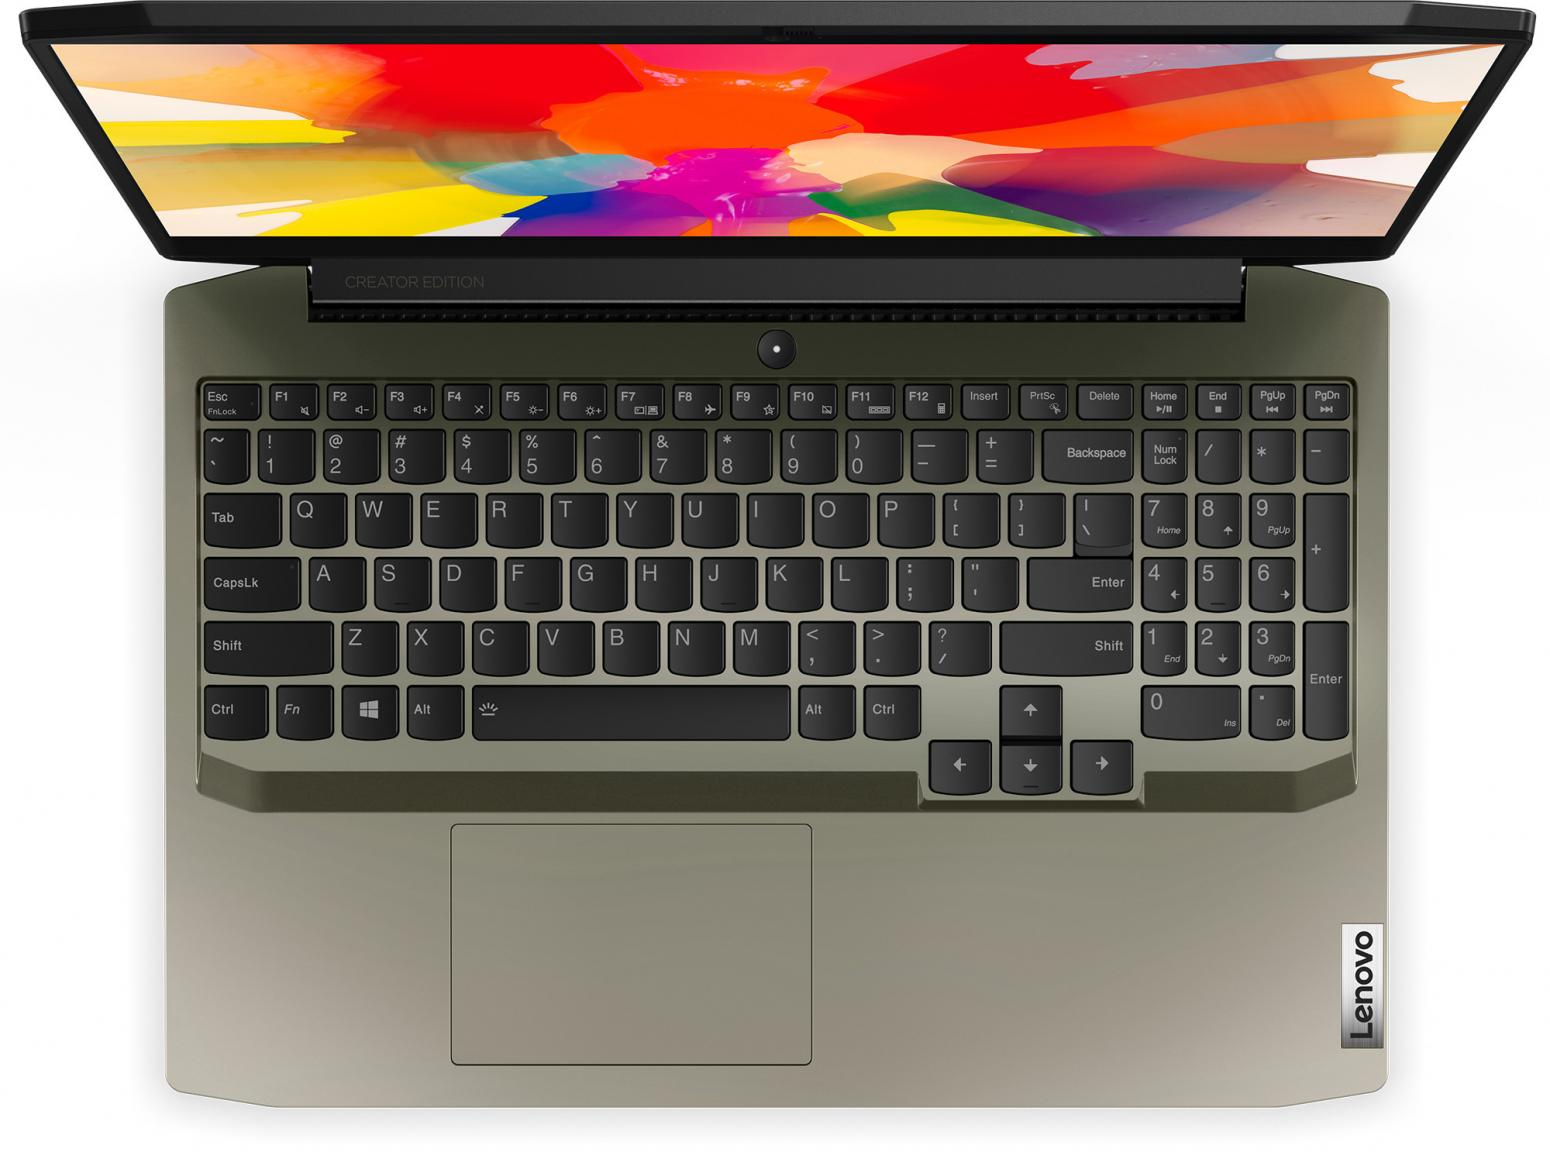 Ordinateur portable Lenovo  IdeaPad Creator 5 15IMH05 (82D4004WFR) Vert Kaki - GTX 1650 Ti, 144Hz - photo 4